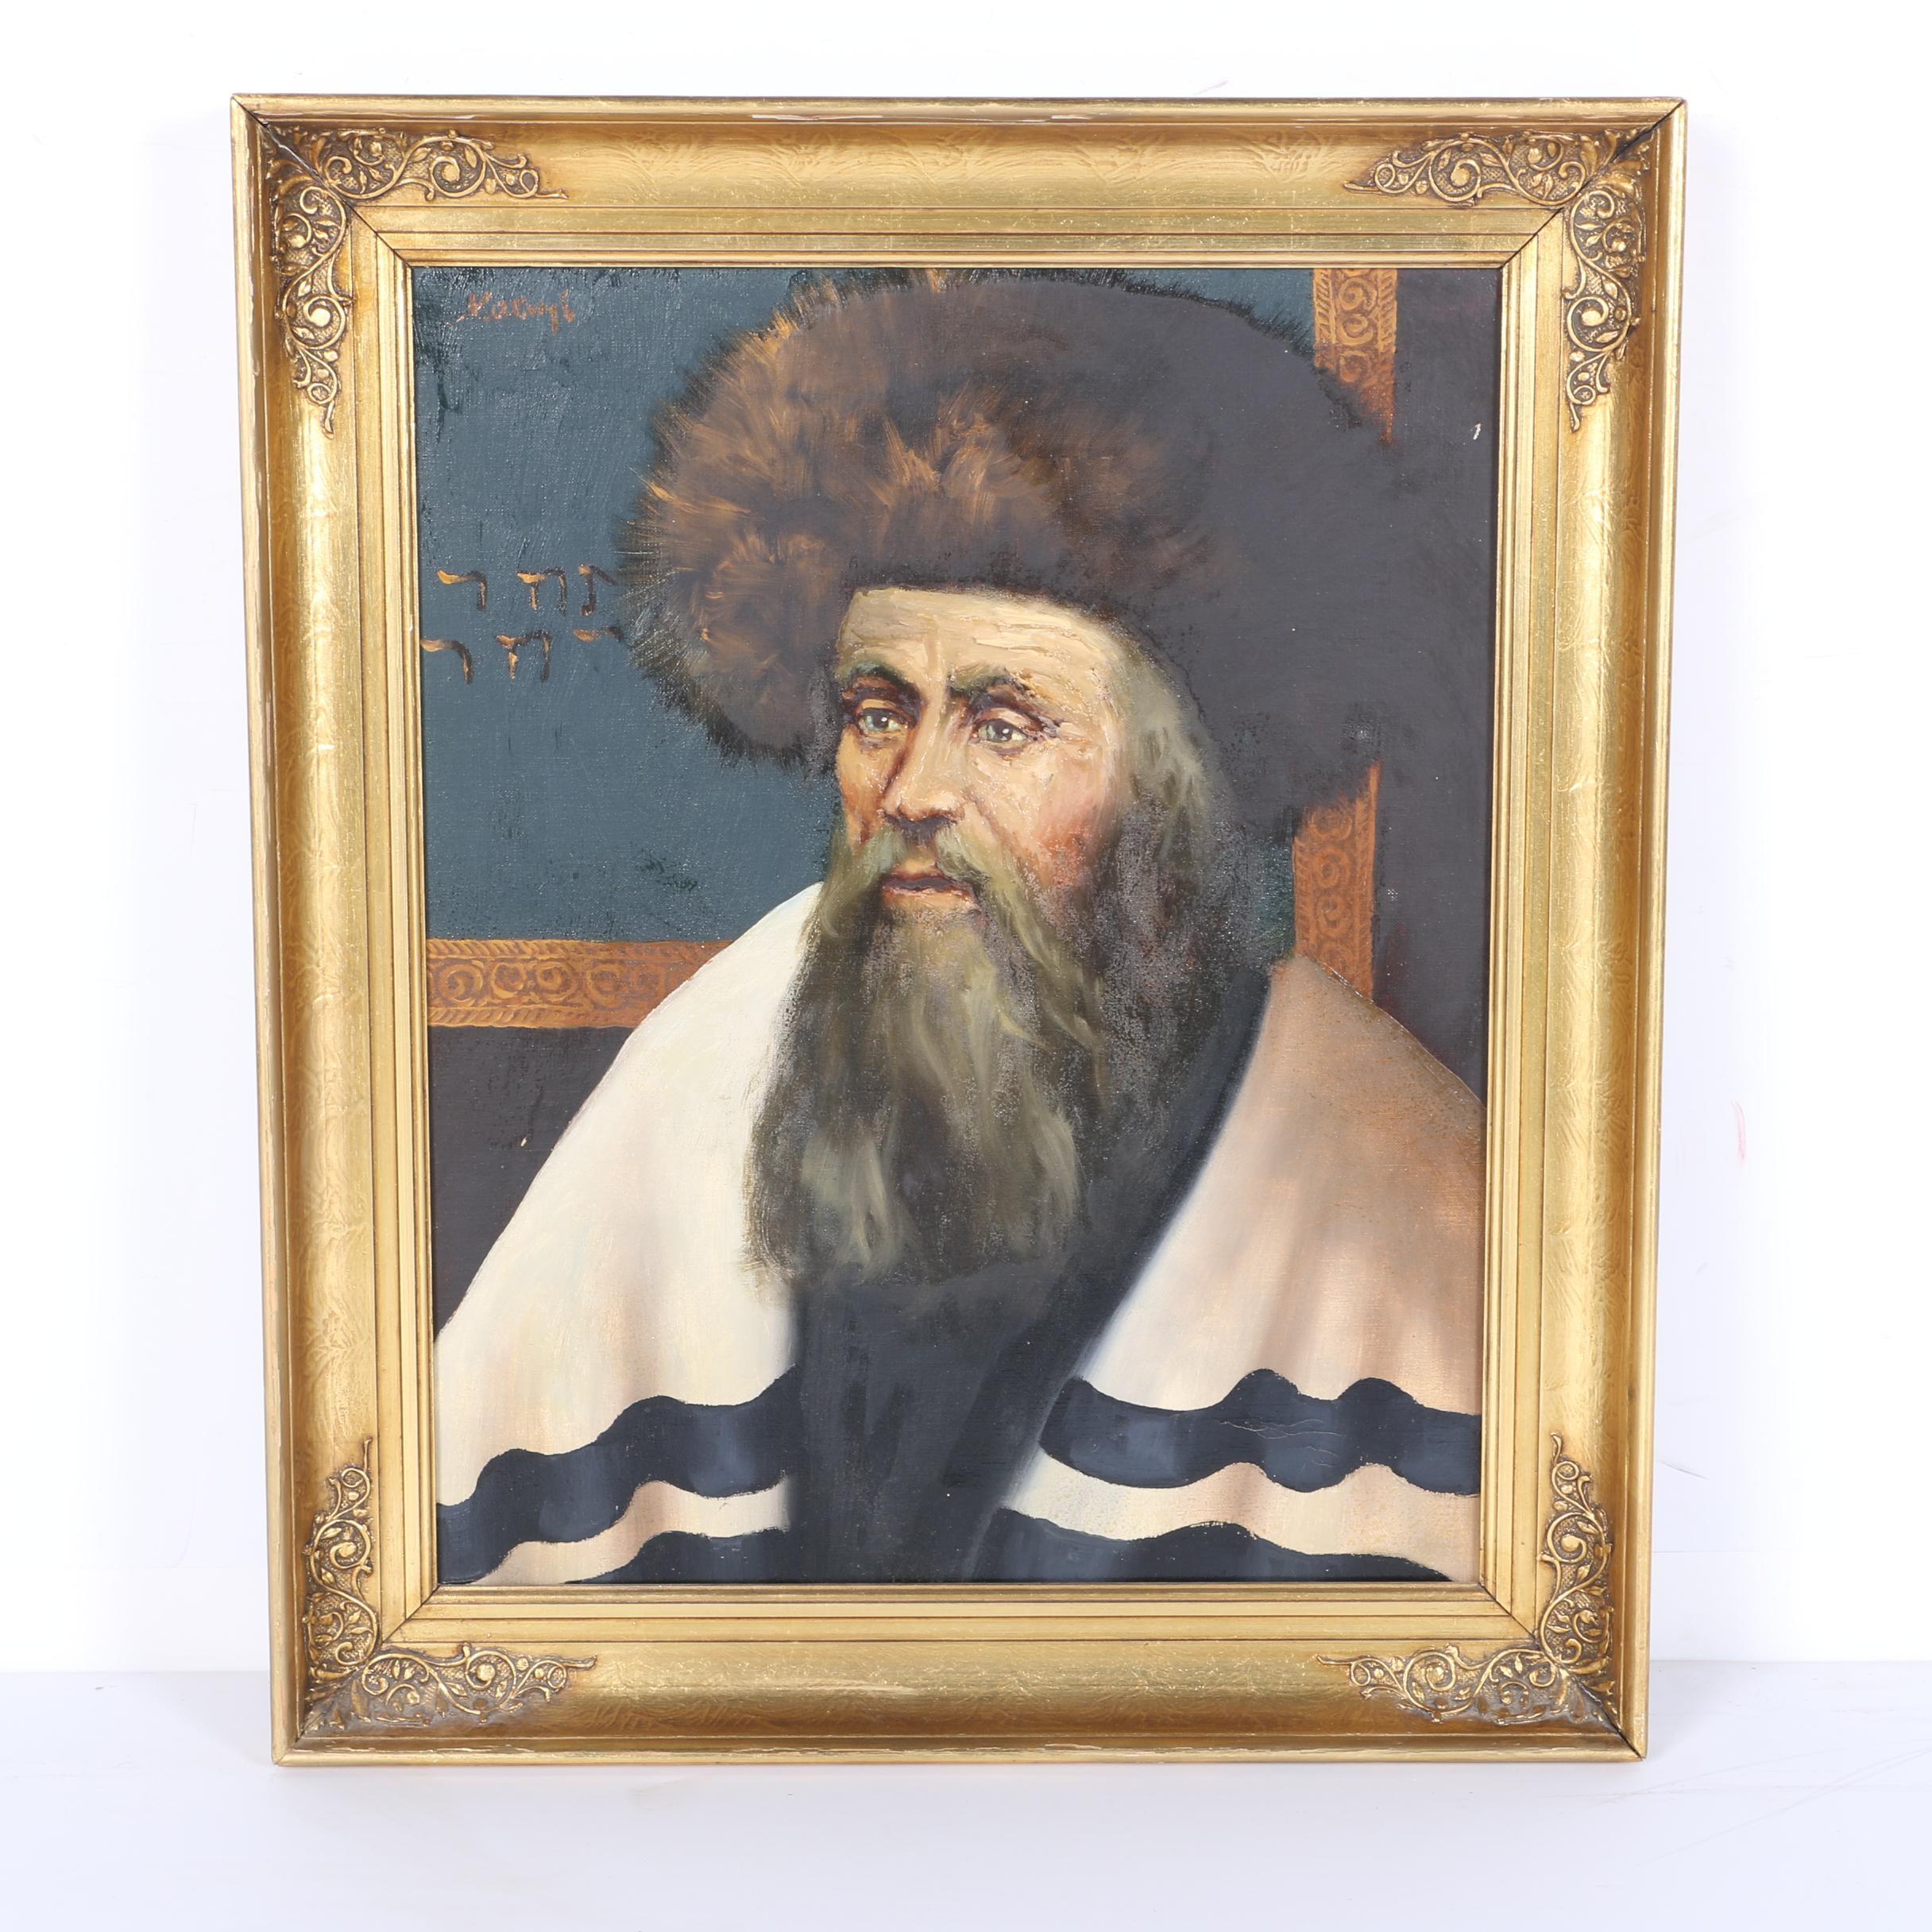 Original Oil on Canvas Portrait of an Orthodox Jewish Man